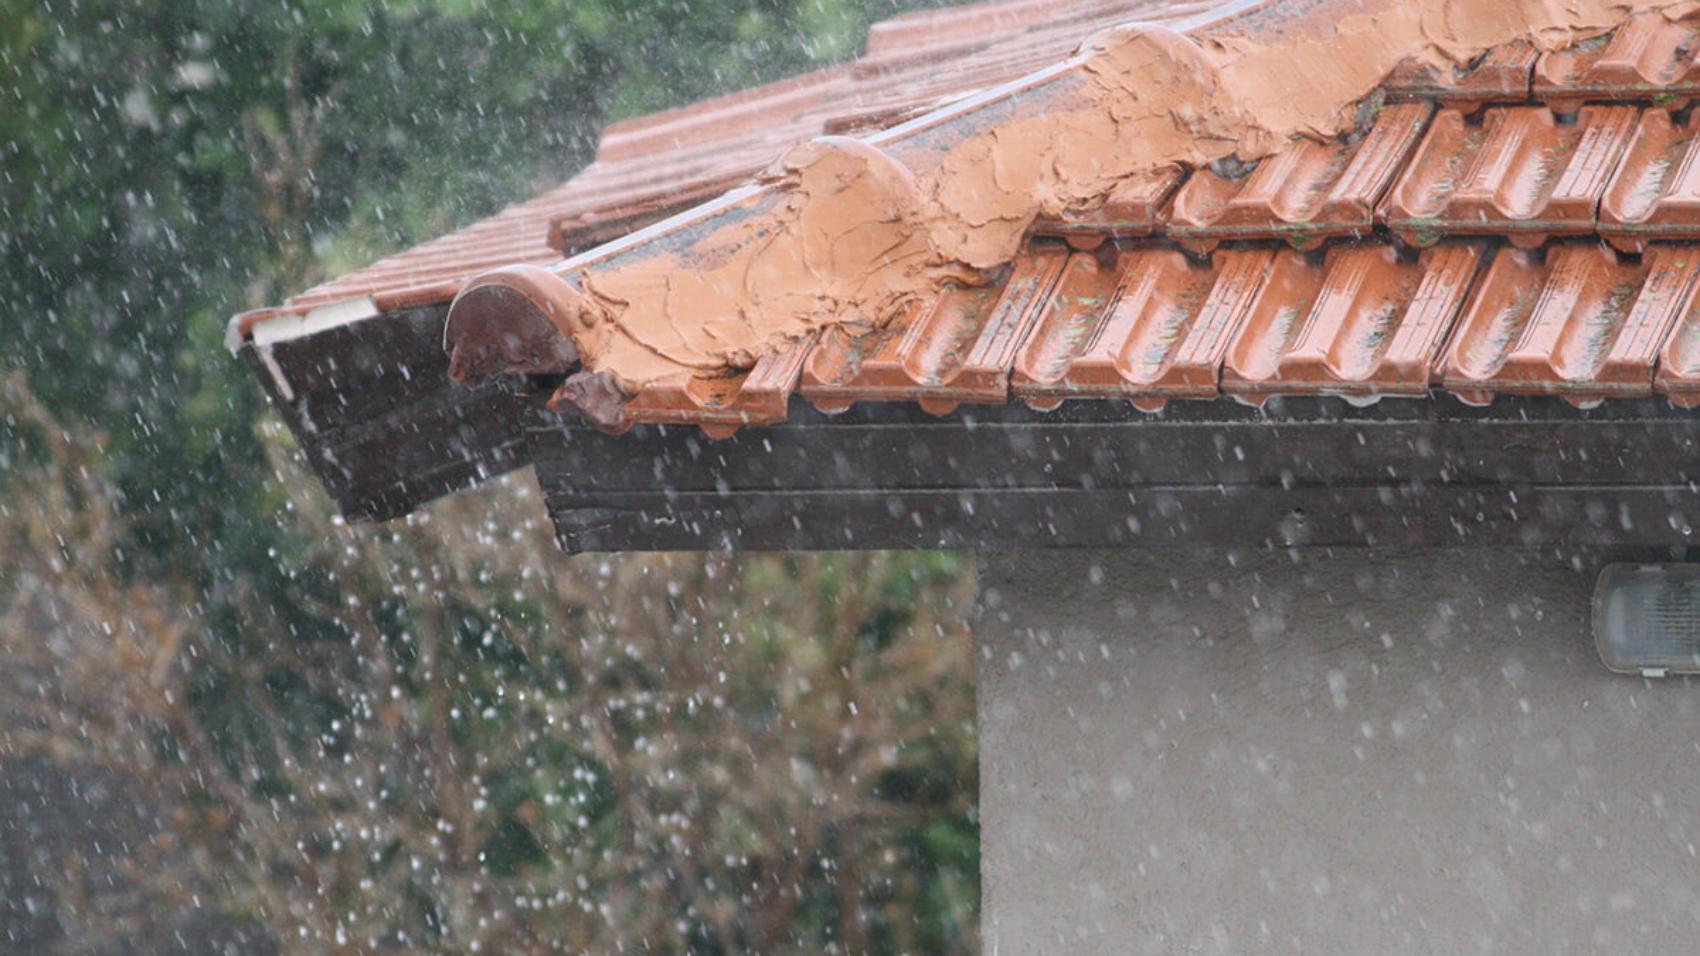 Roof_Tiles_in_the_rain